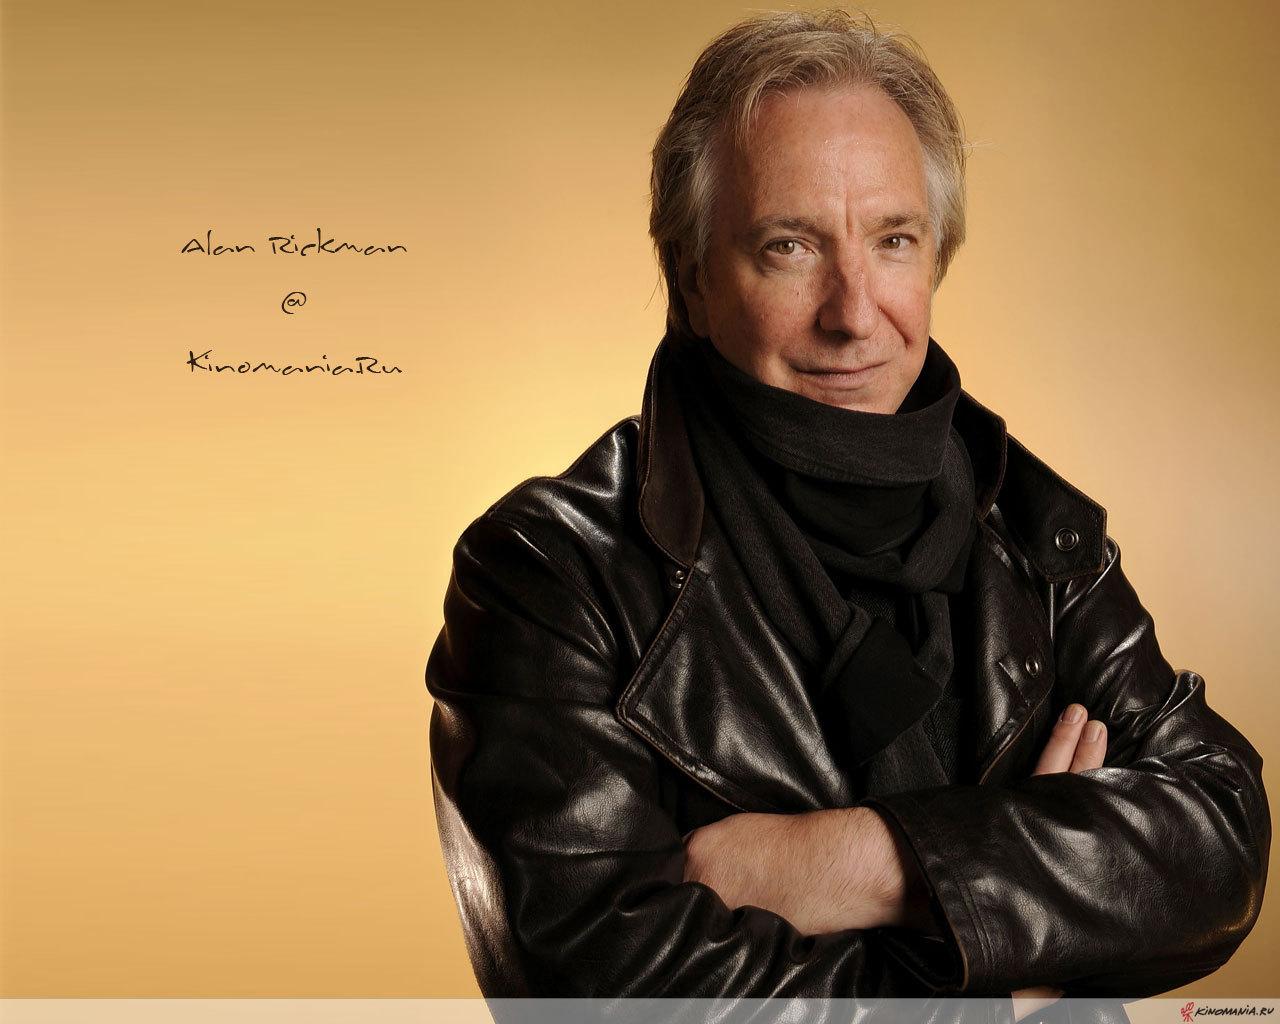 Alan Rickman / Wallpaper - Alan Rickman Wallpaper (7878037